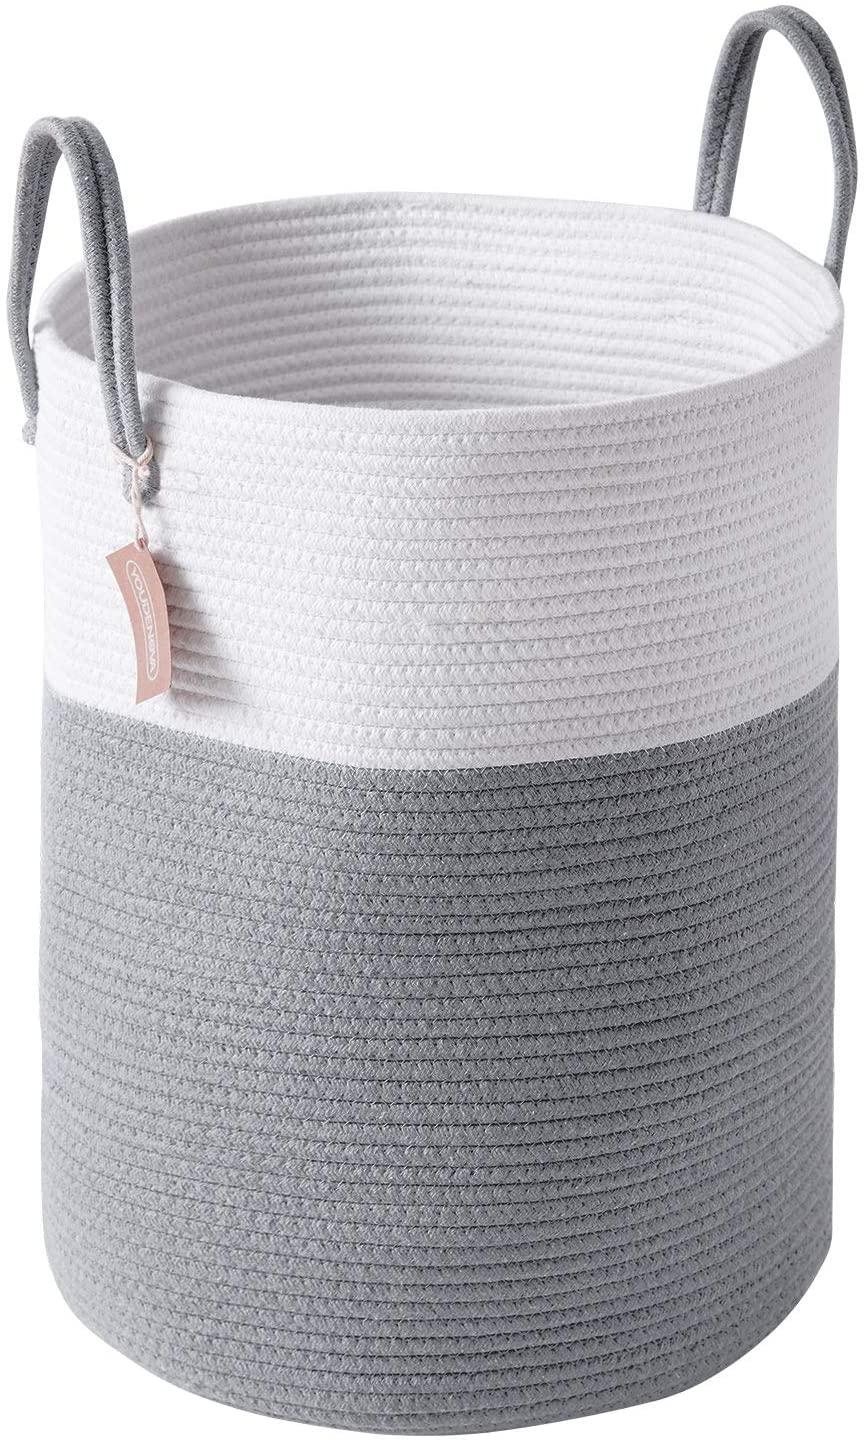 Youdenova 58l Large Woven Laundry Hamper Basket 15dx20h Tall Decorative Wicker For Sale Online Ebay